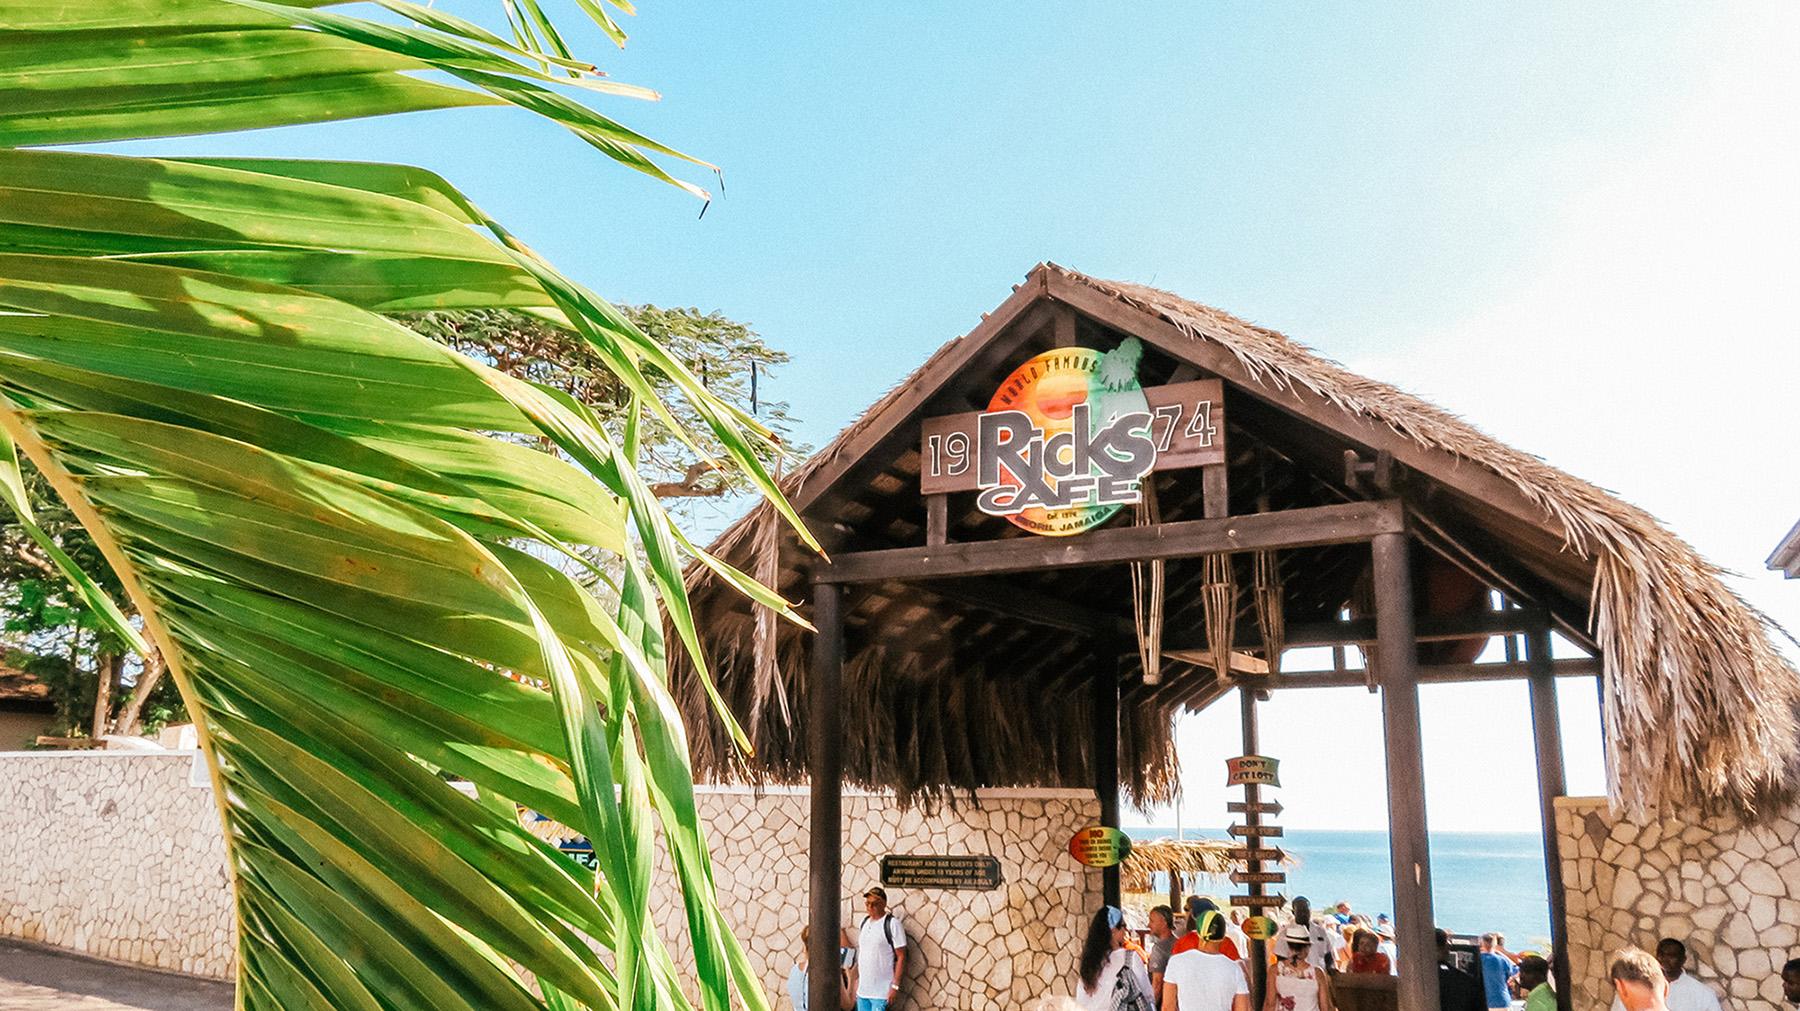 Mittelamerika Kreuzfahrt Montego Bay Jamaika Reisebericht Titel